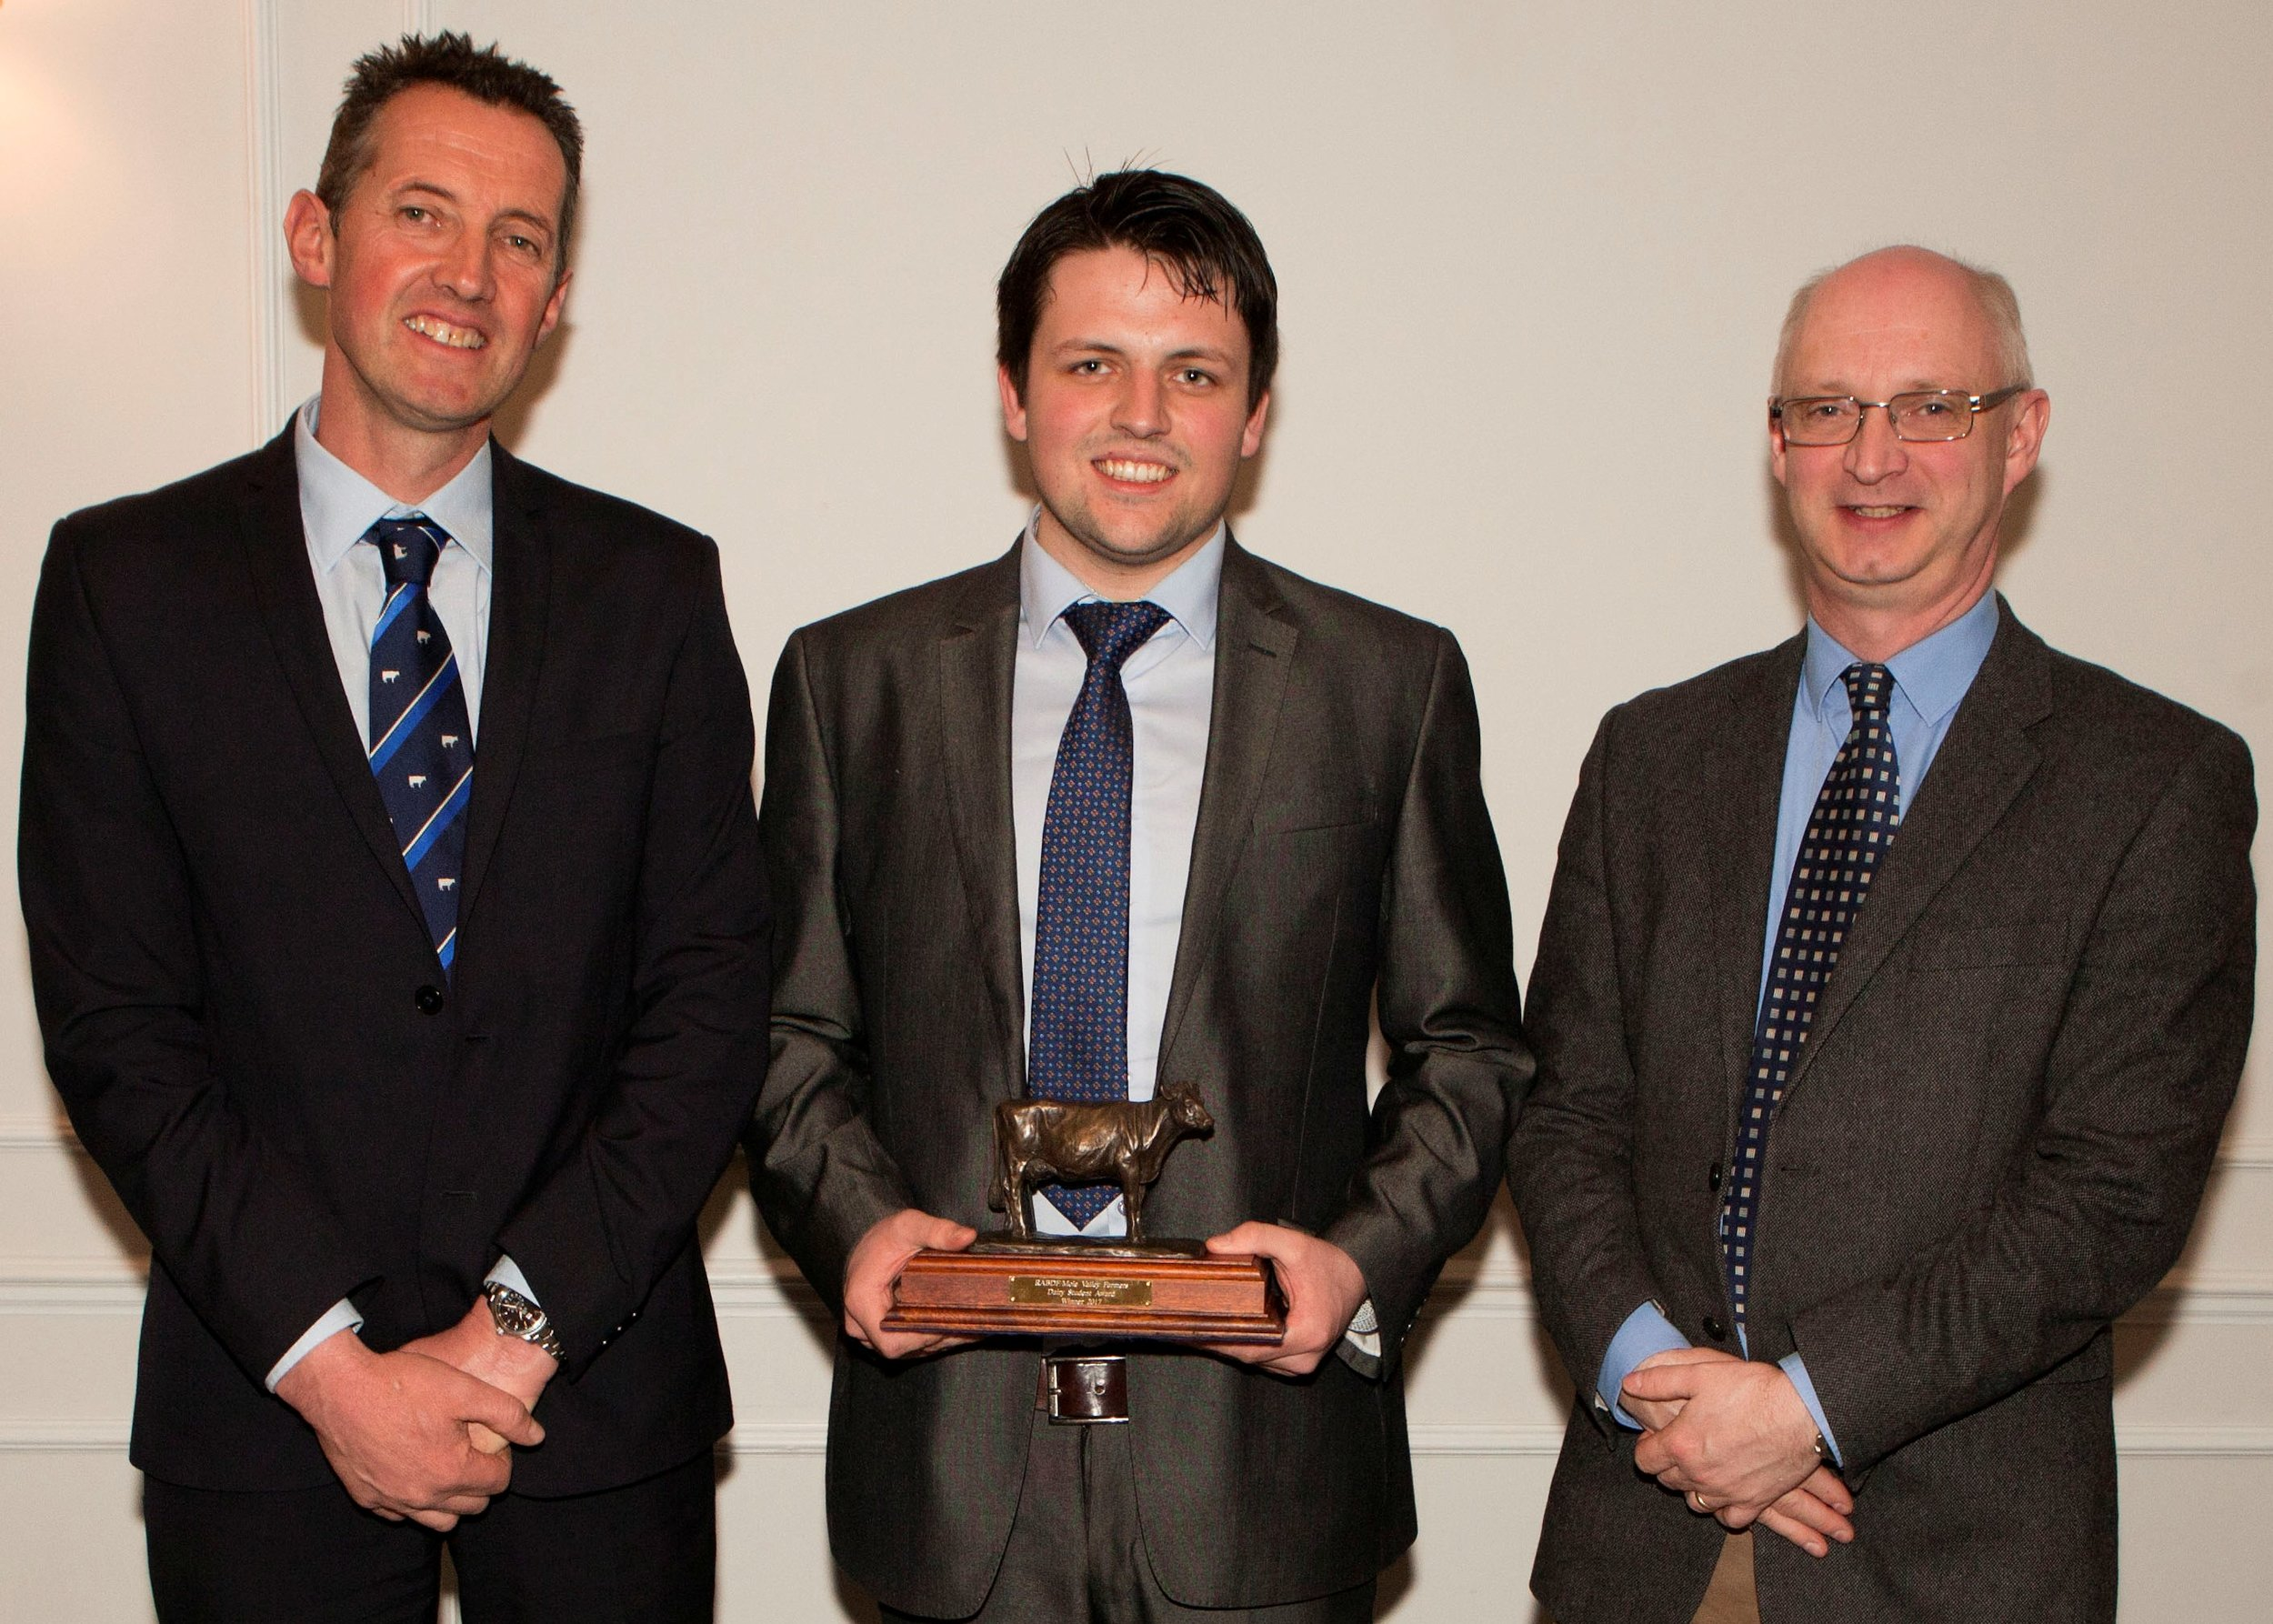 Mike King, RABDF chairman, Richard Beattie and Prof Liam Sinclair, Harper Adams University